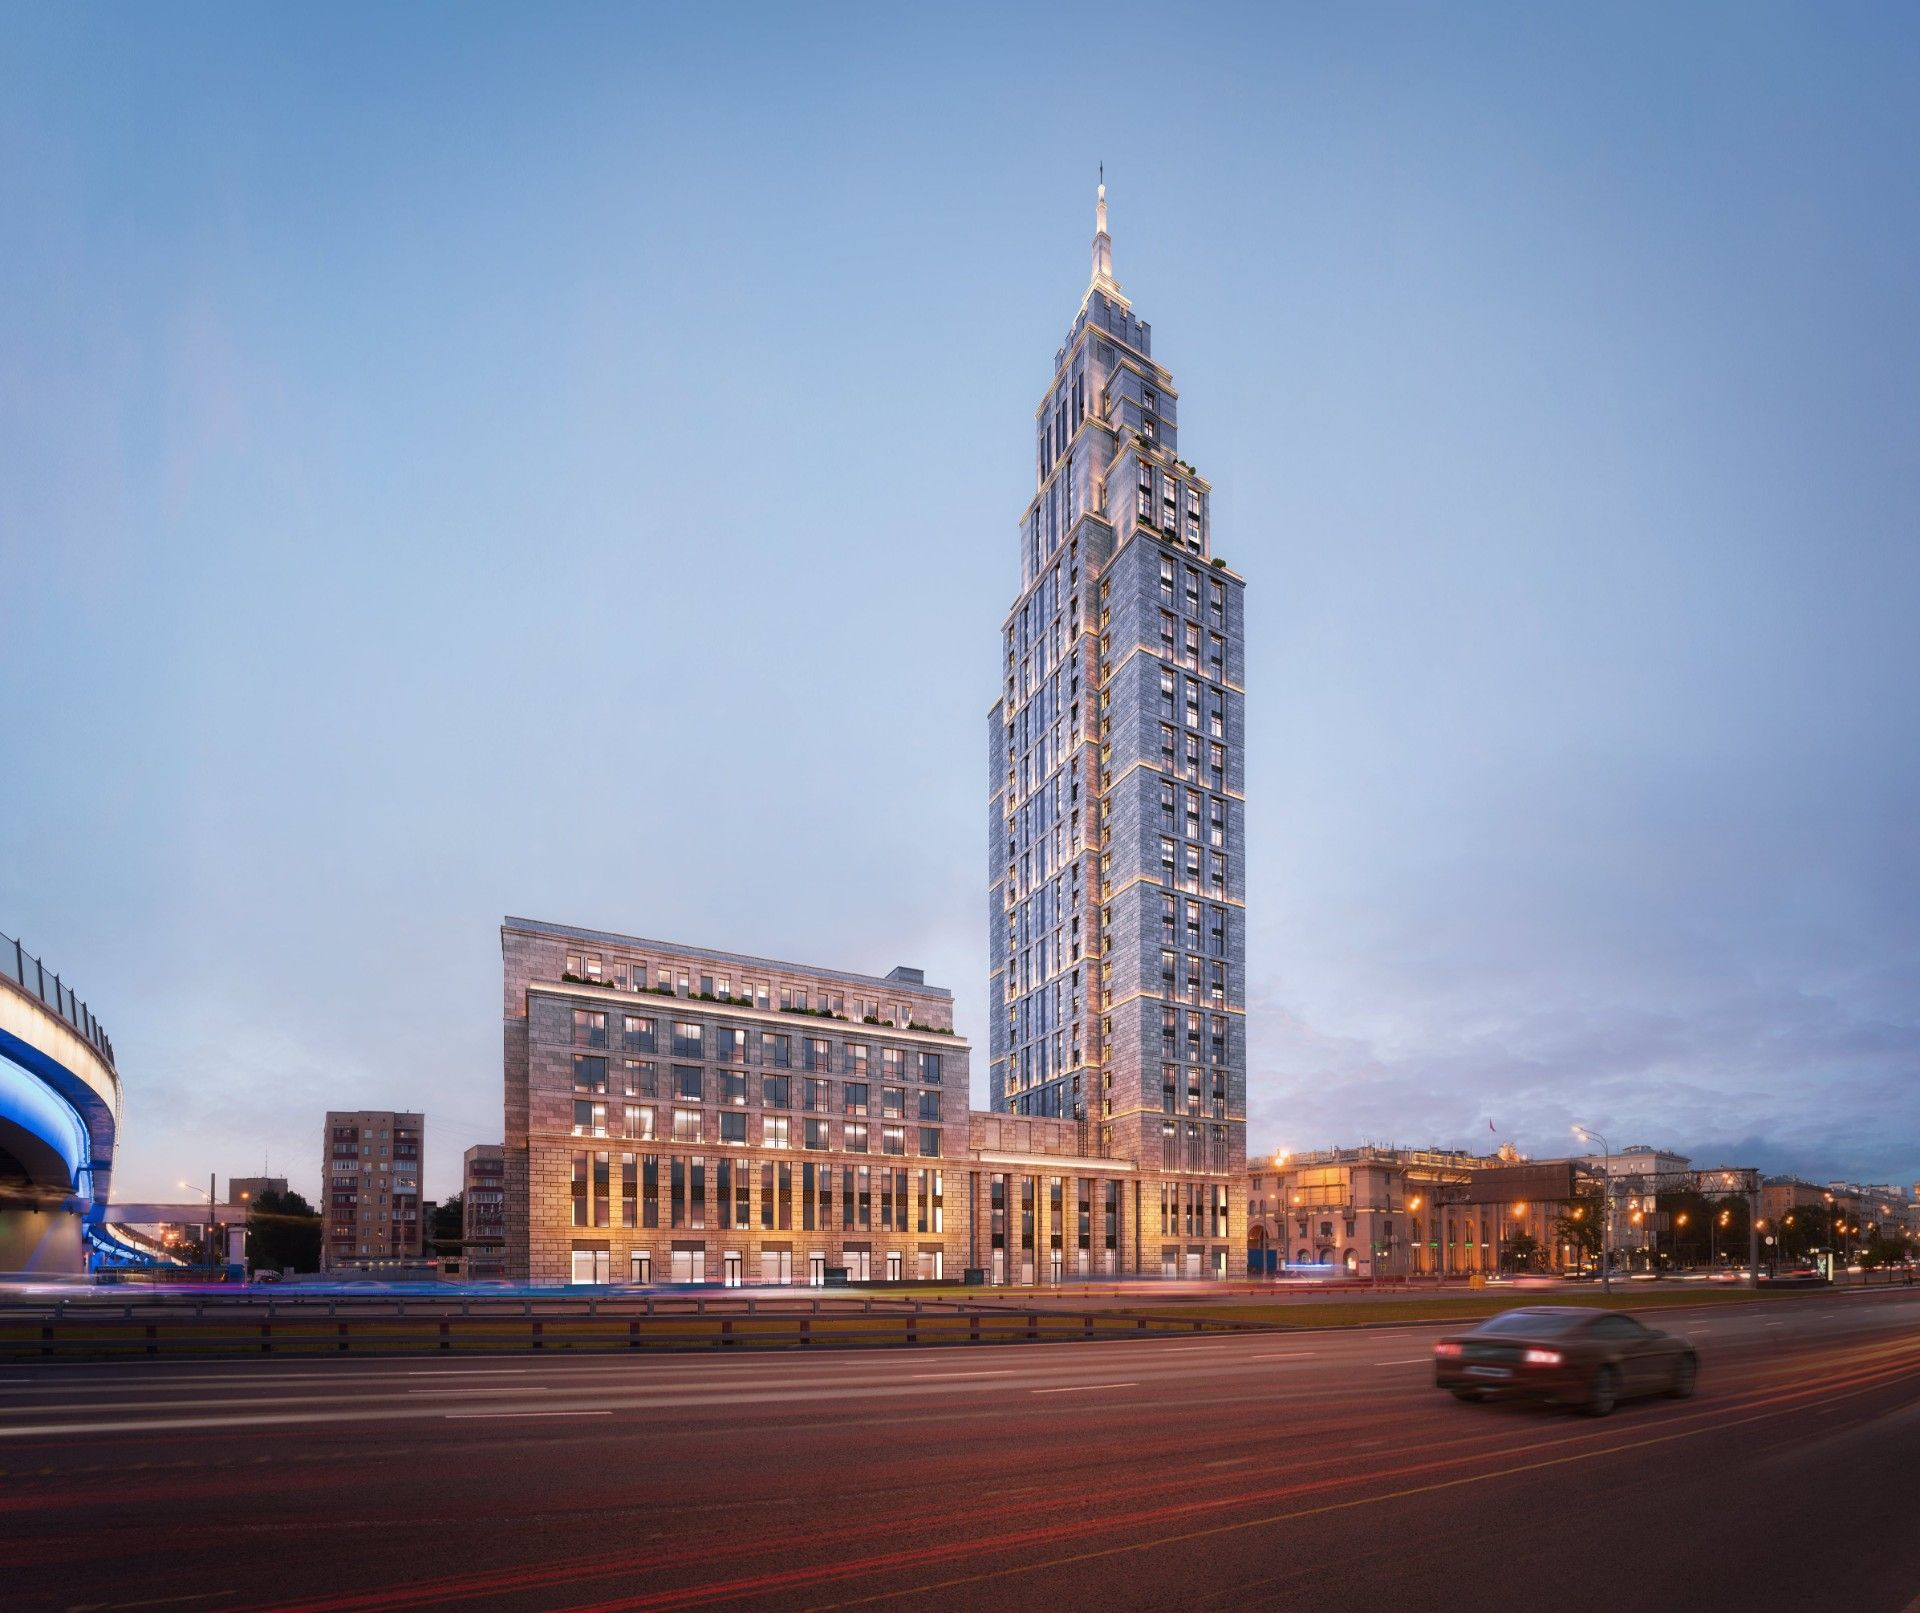 ЖК Комплекс апартаментов Alcon Tower (Алкон Тауэр)